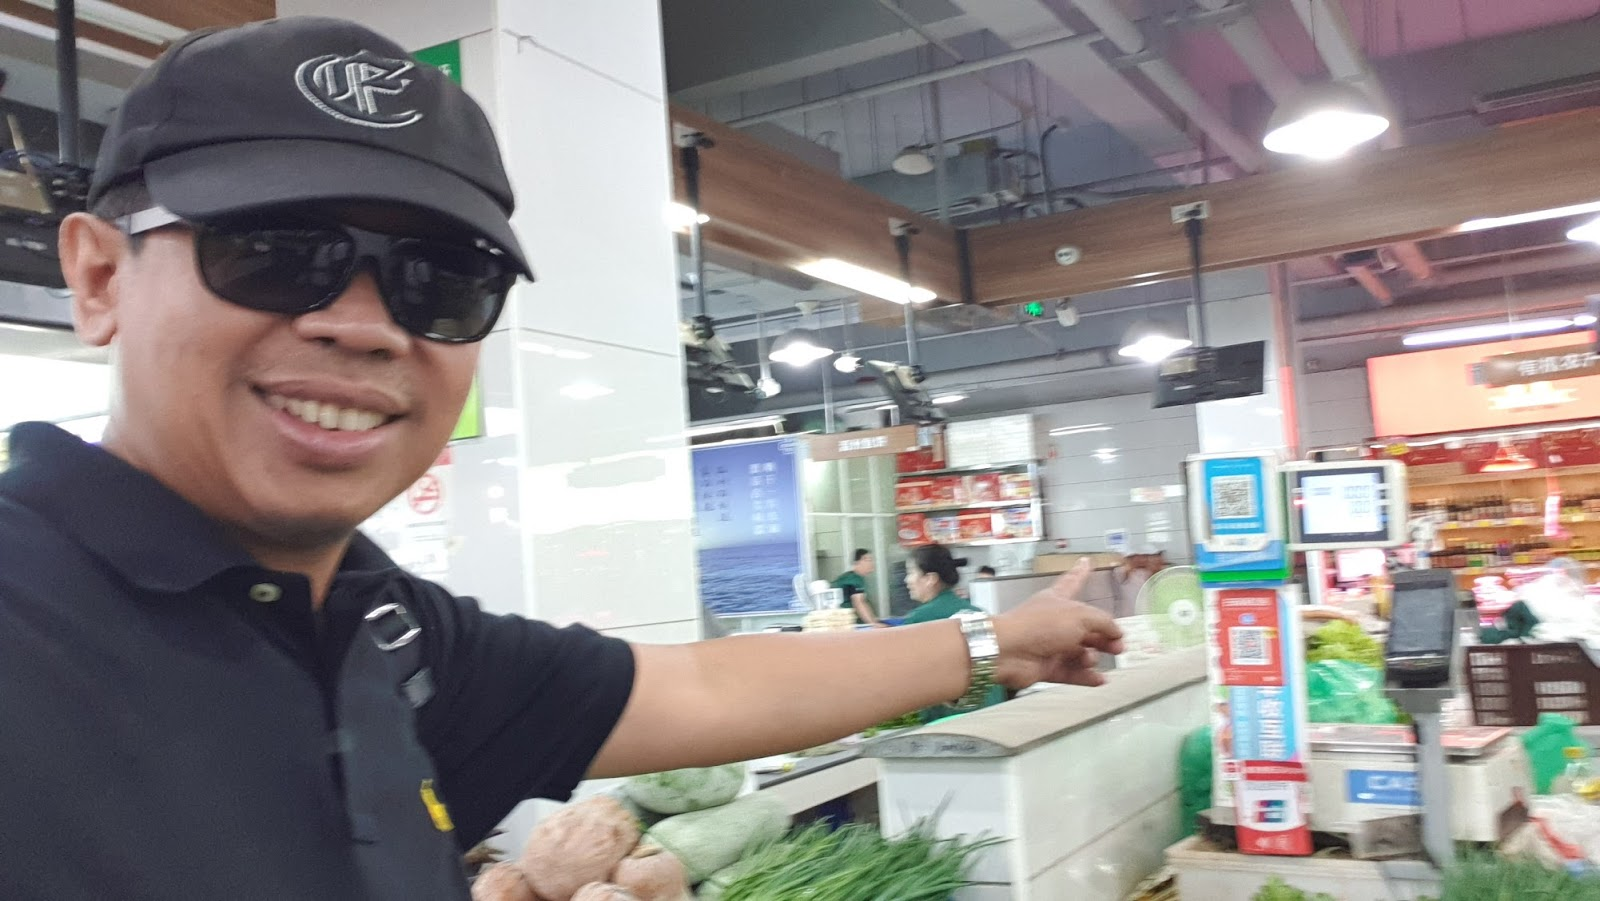 Pemain QR Code Asing Wajib Bekerjasama dengan Penerbit dan atau Acquirer Indonesia